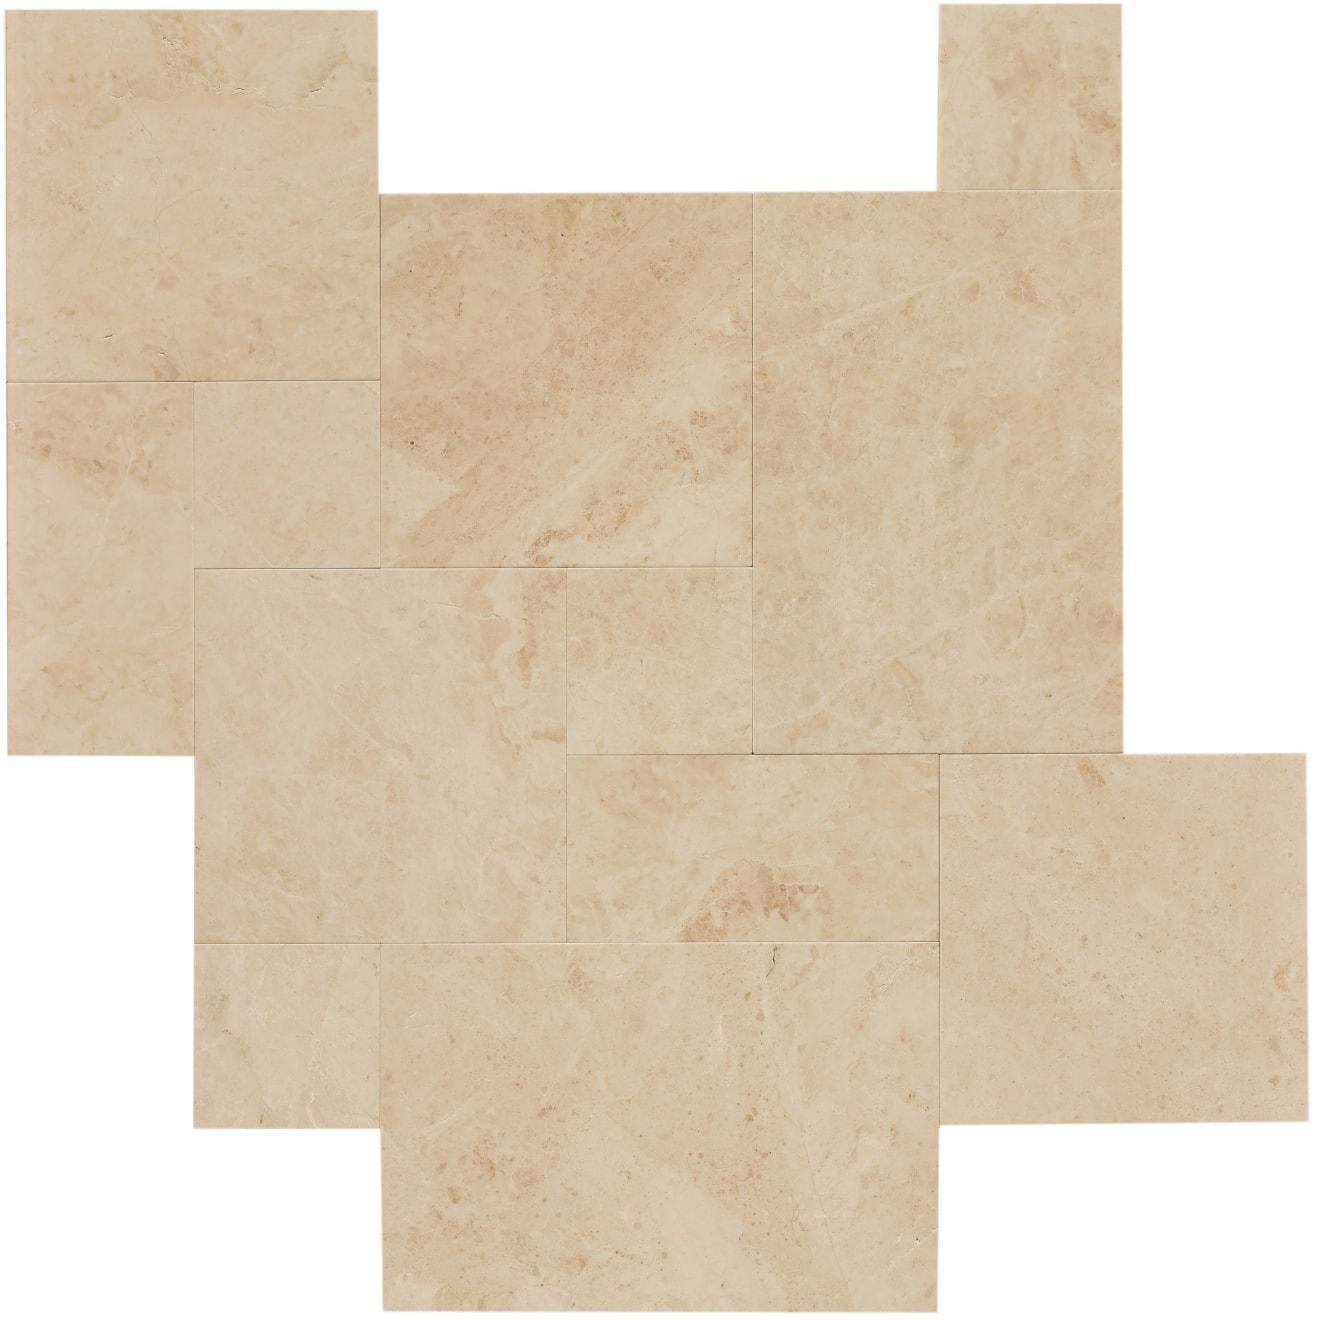 Cappuccino Floor & Wall Tile